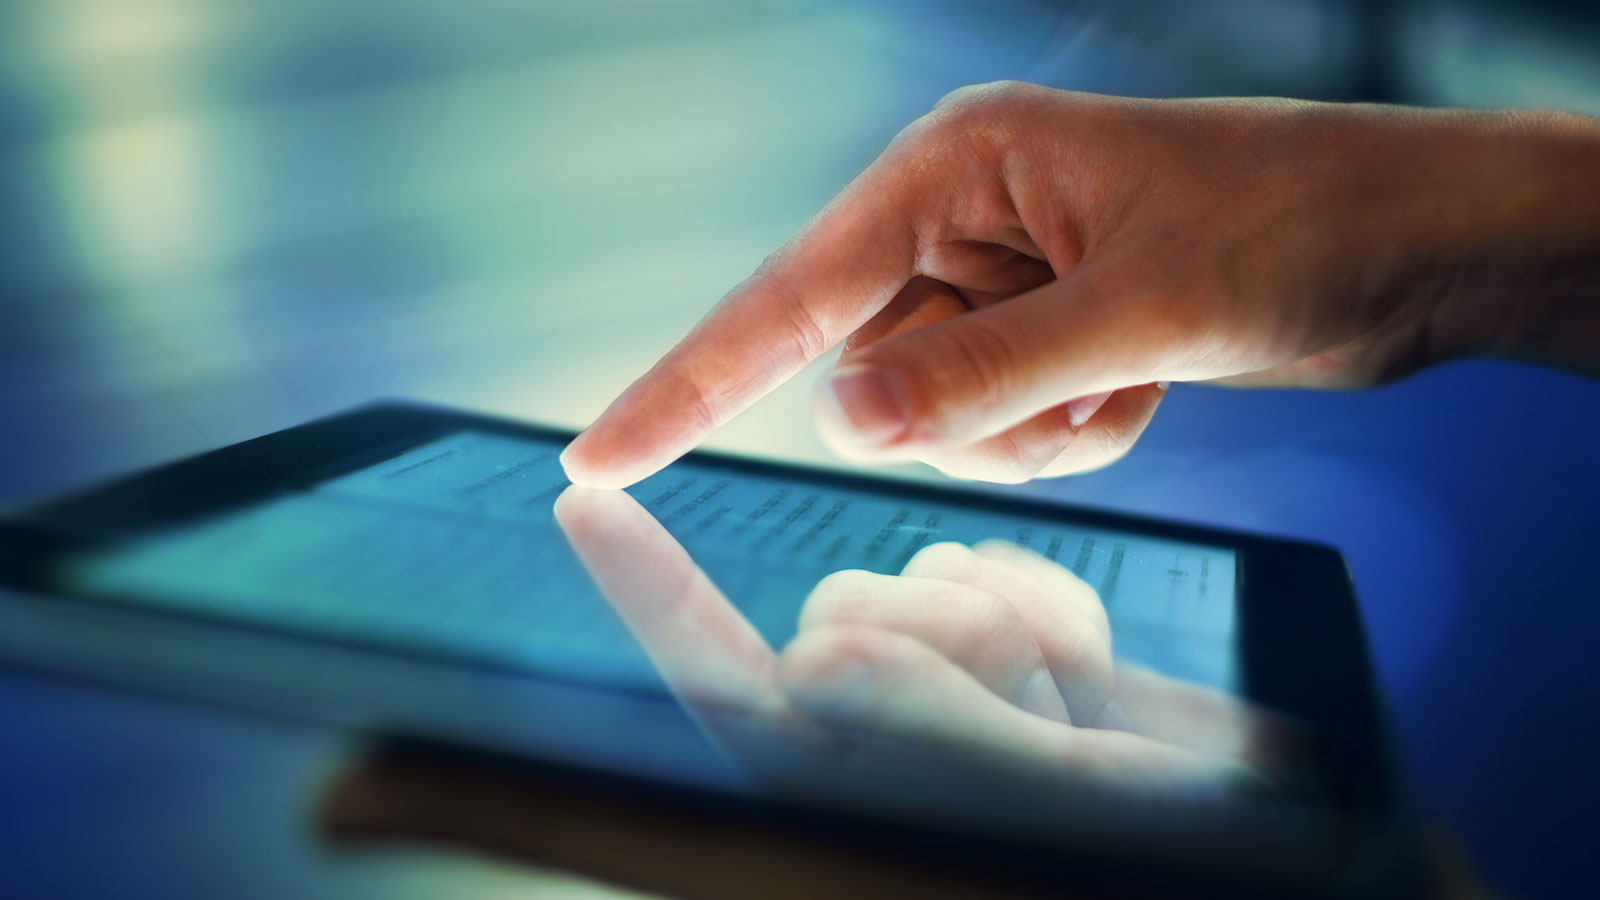 Finger touching tablet